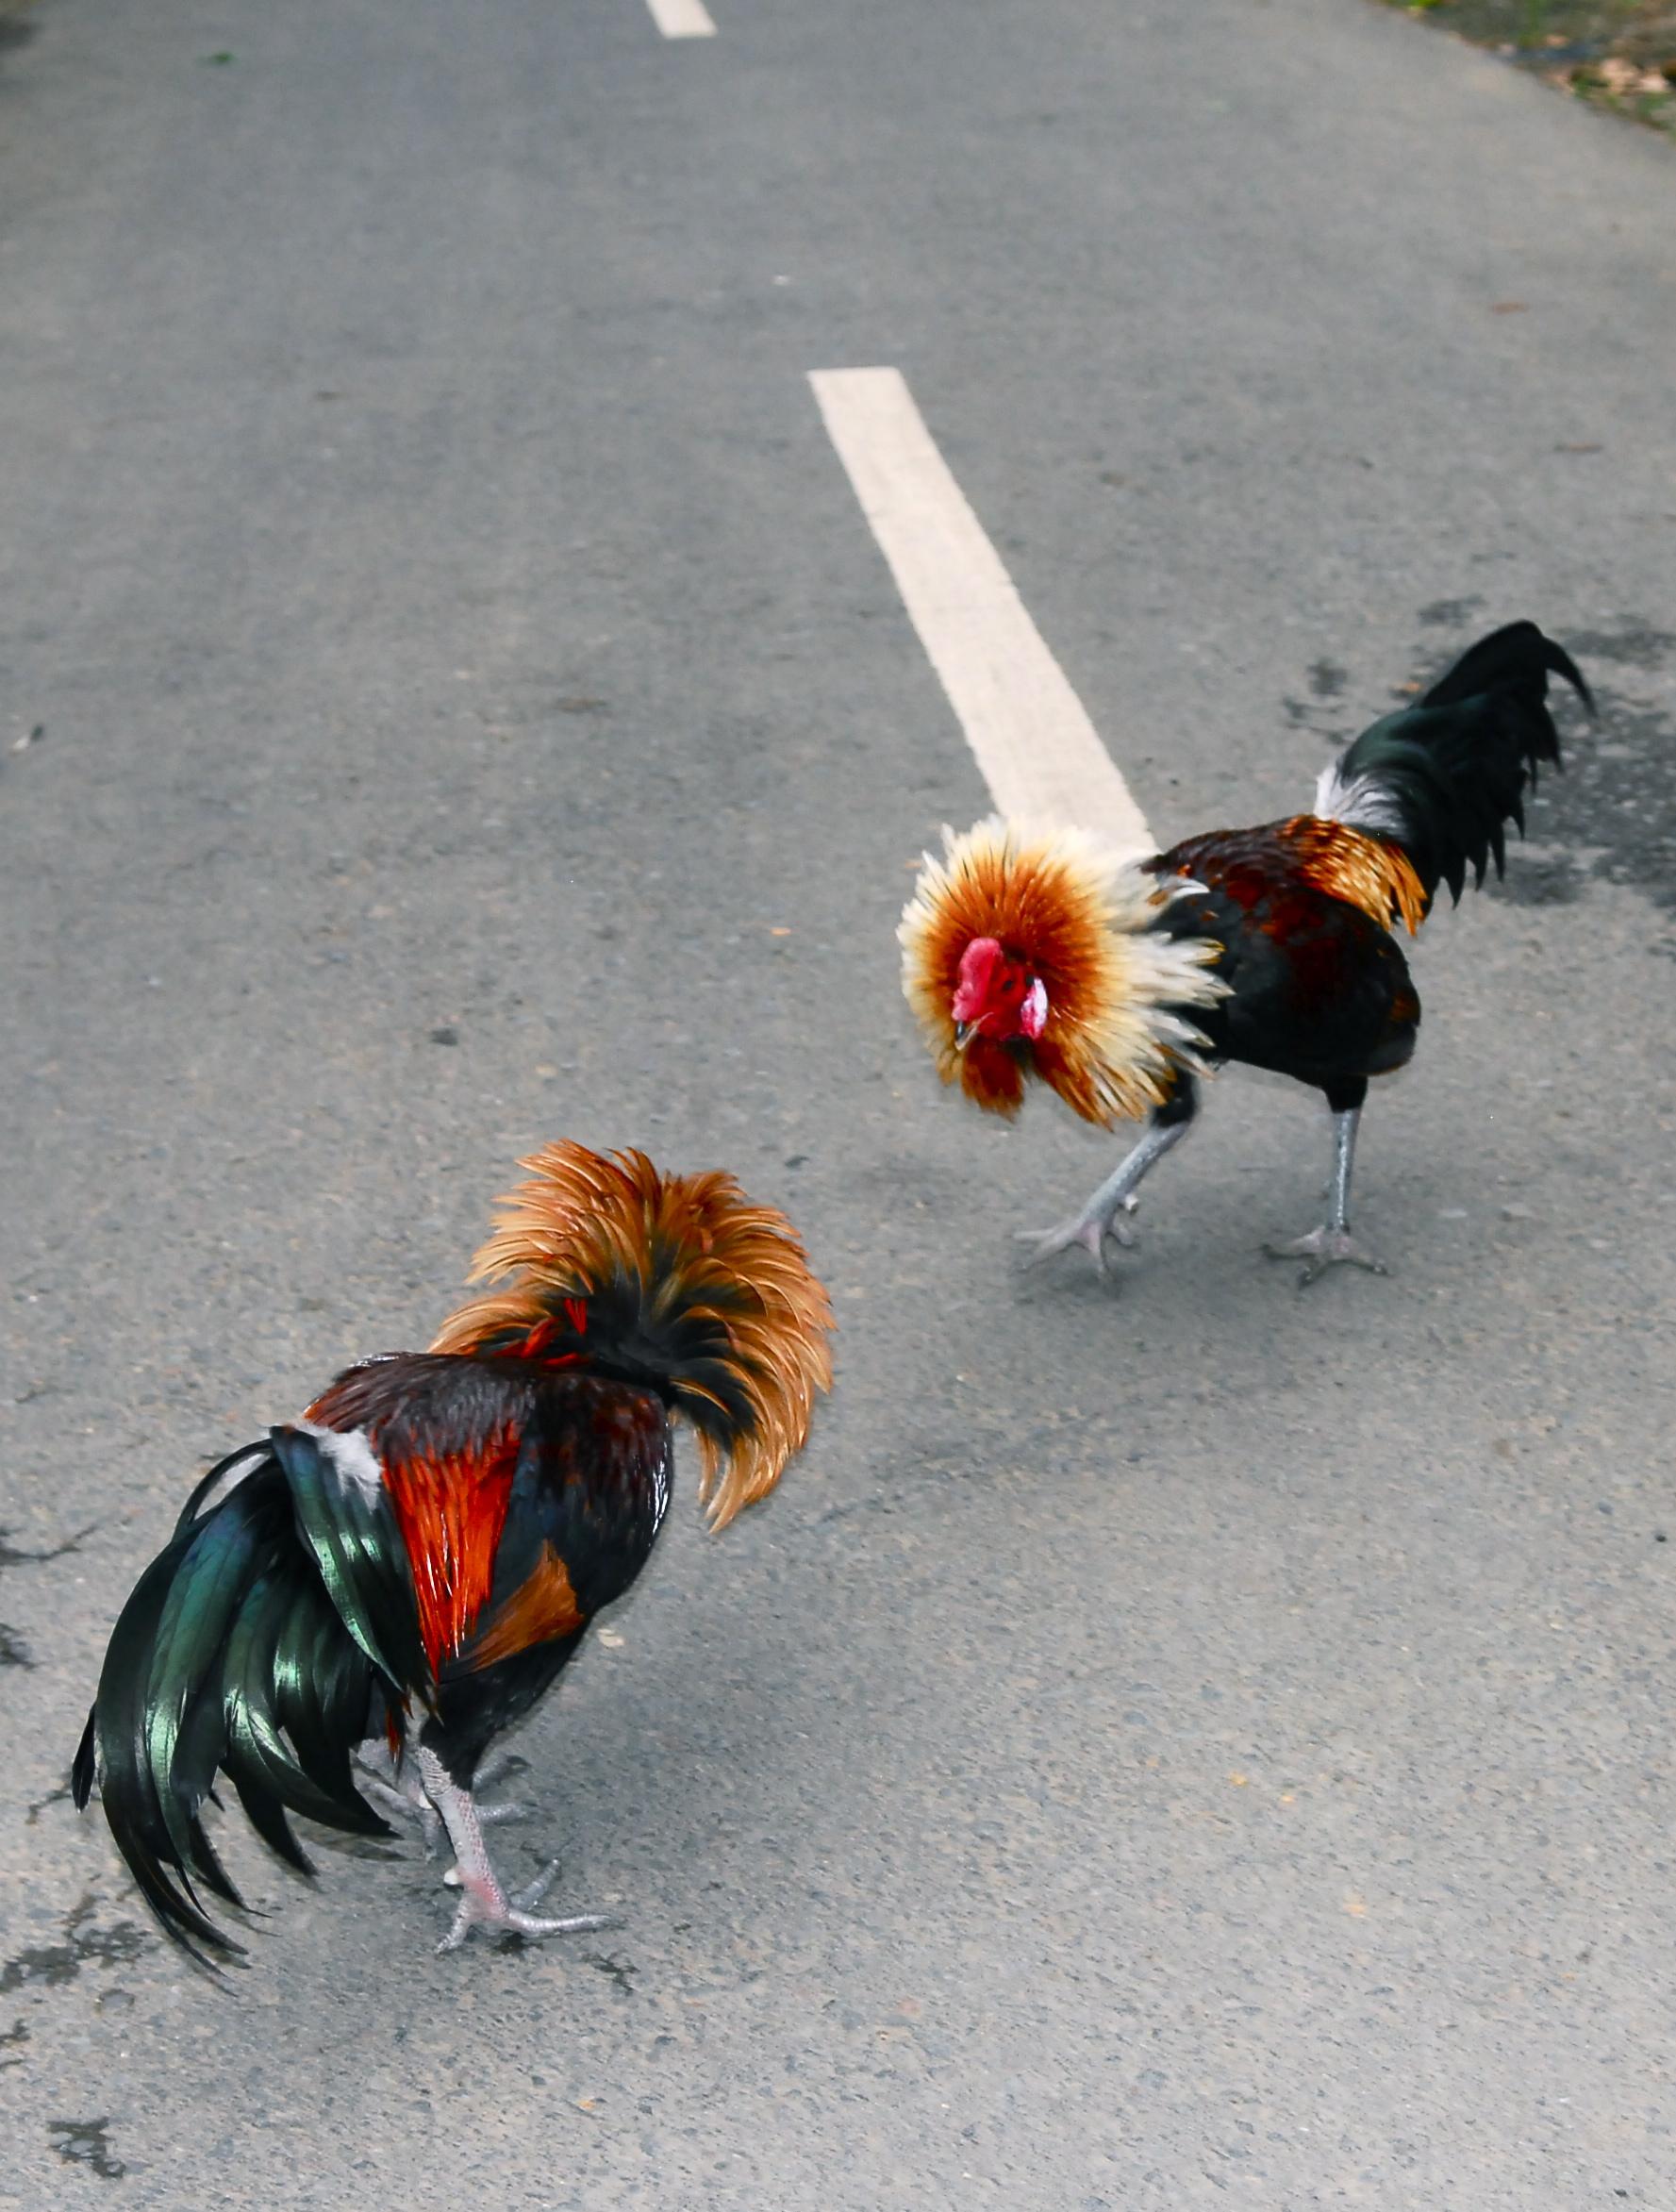 Cocks Jpg 85